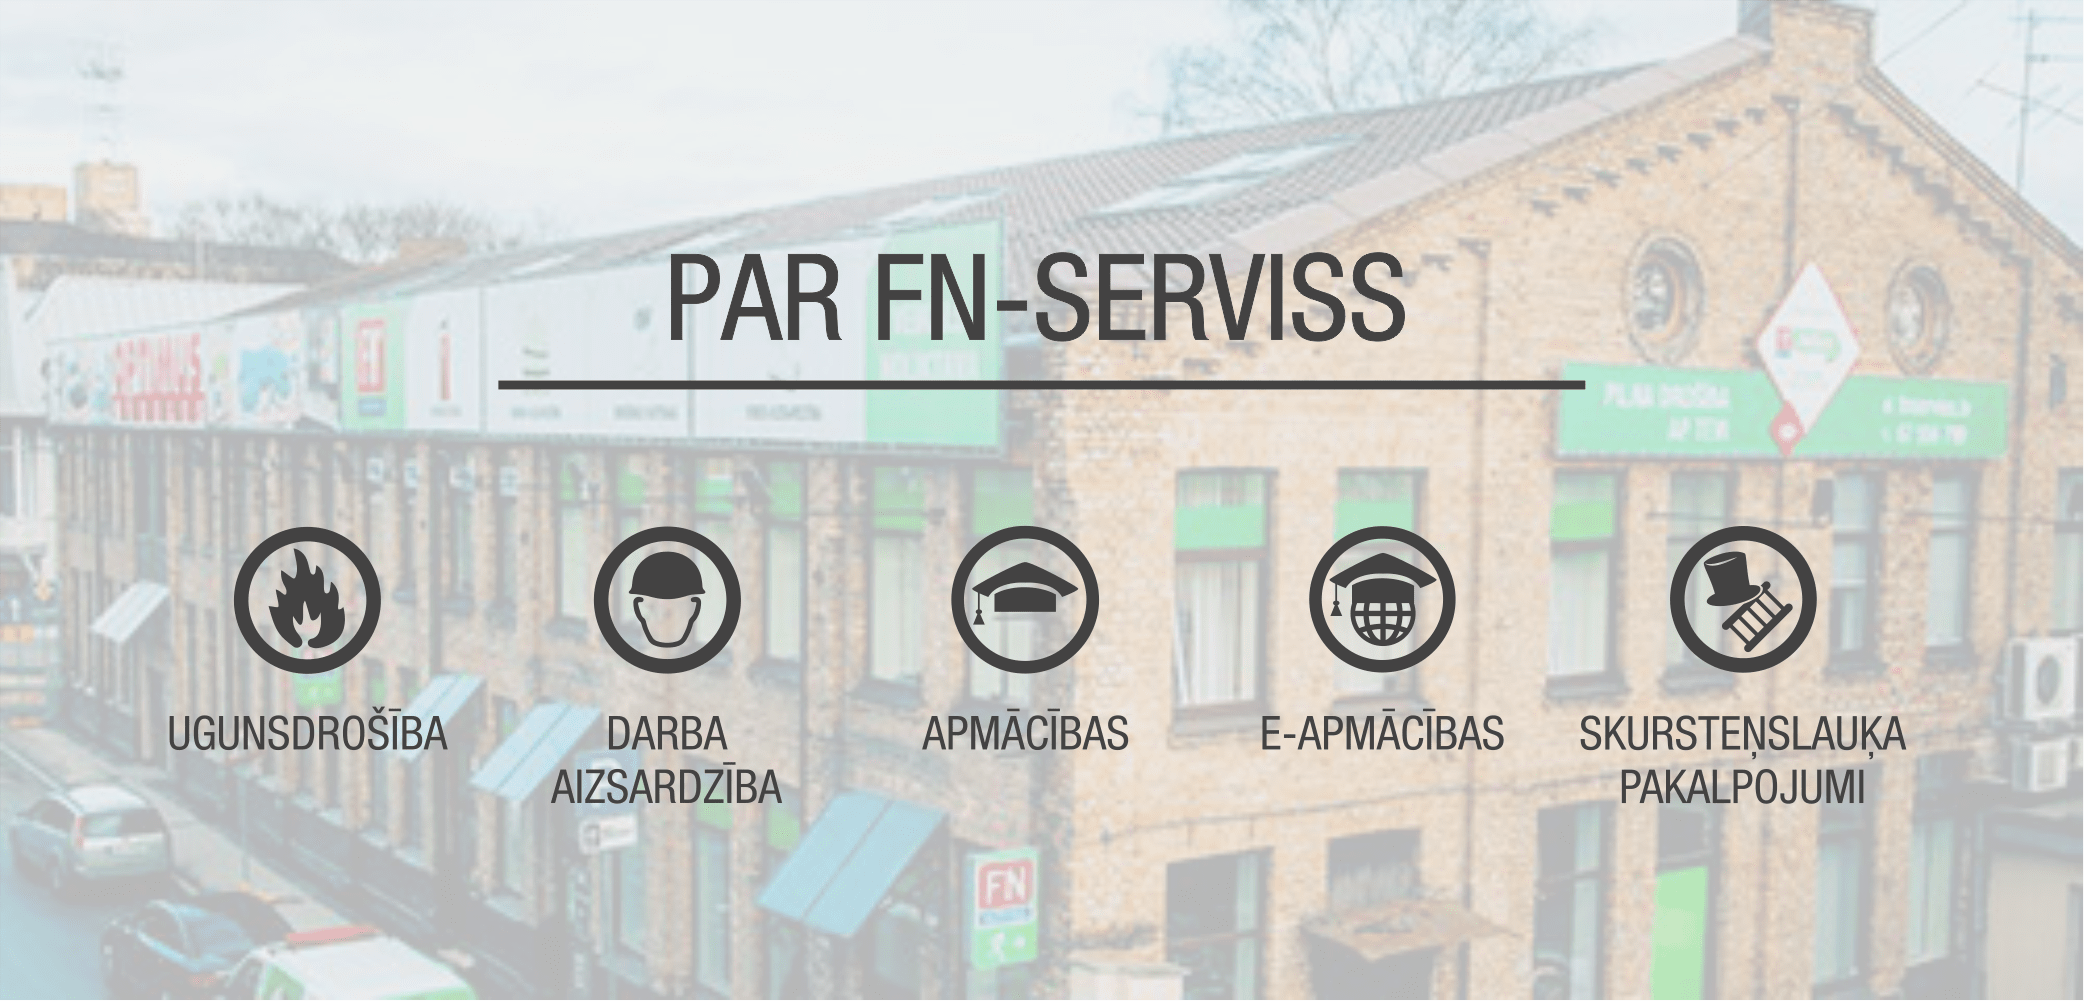 Par FN-SERVISS